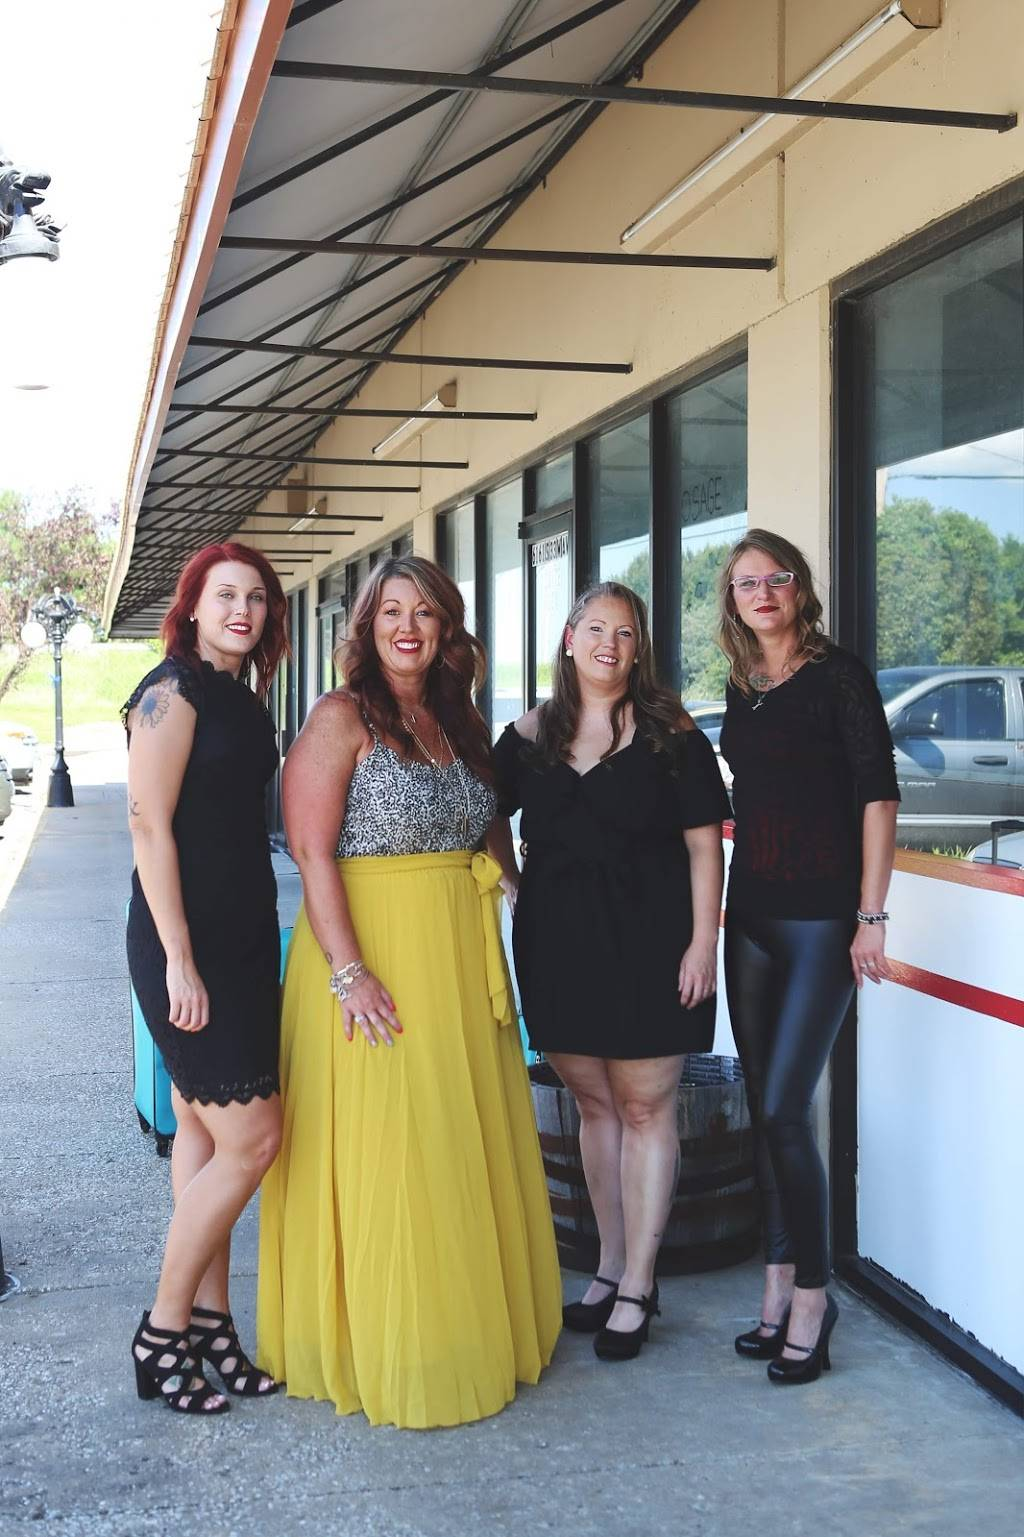 Amandas Cutting Edge - hair care  | Photo 1 of 6 | Address: 6161 S 33rd W Ave #107, Tulsa, OK 74132, USA | Phone: (918) 445-9940